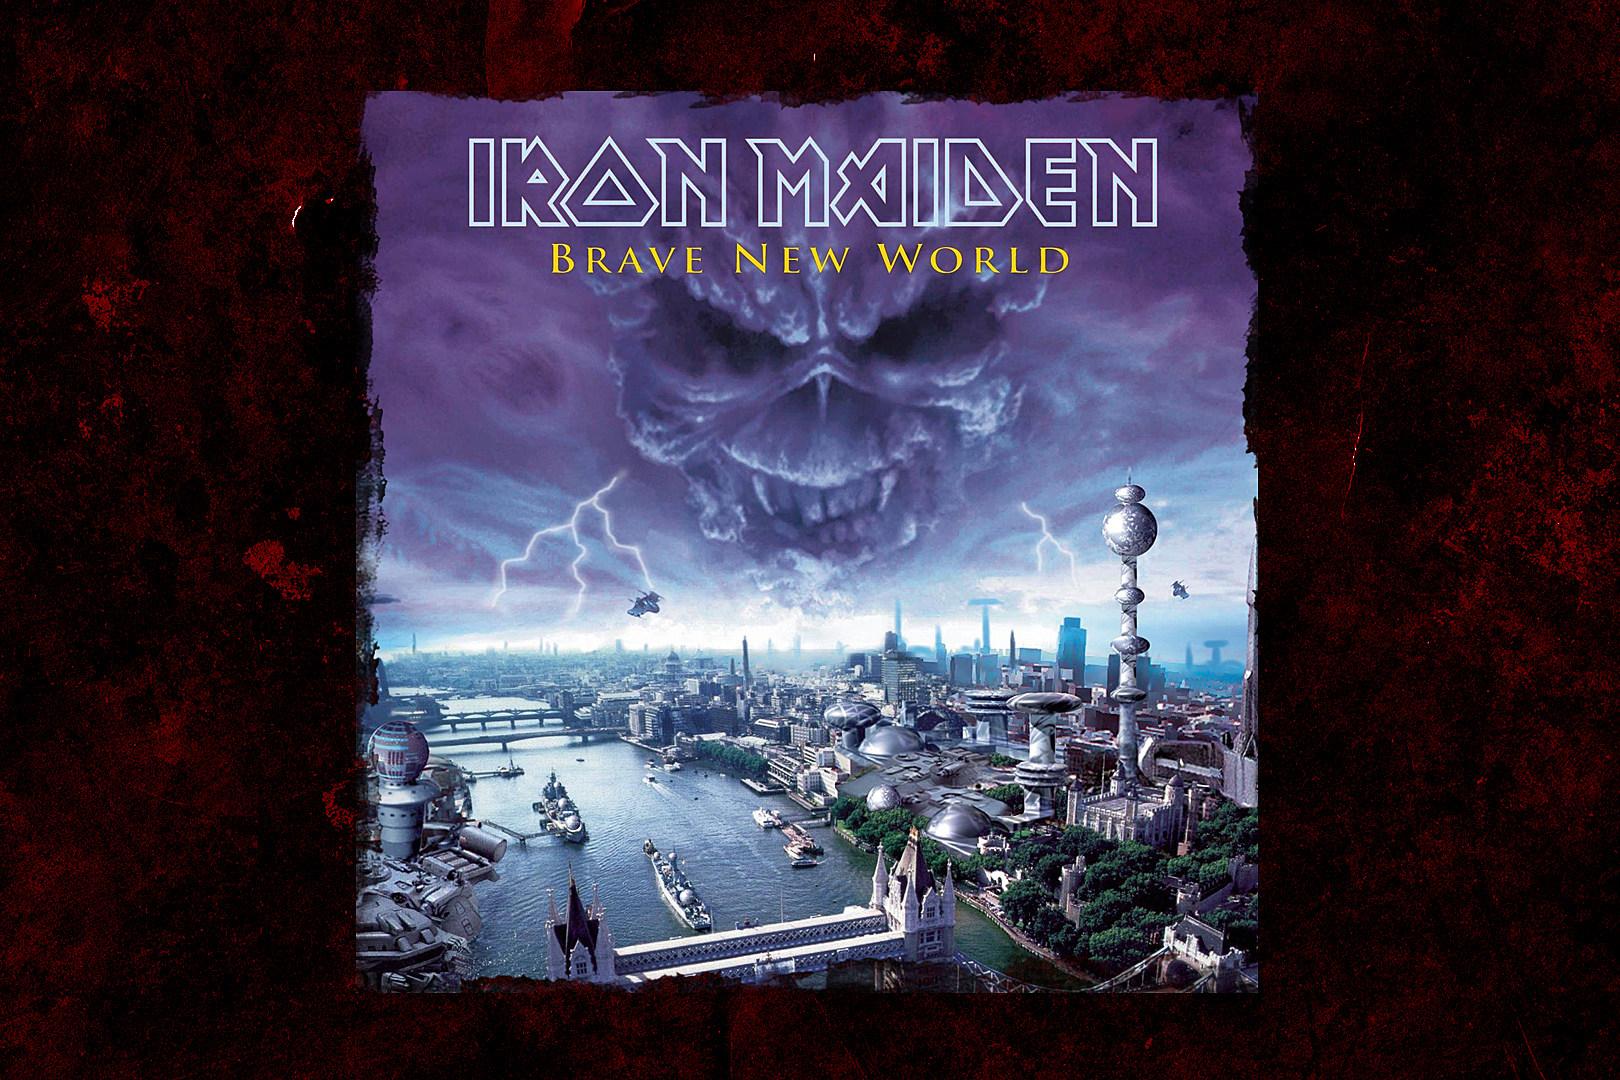 20 Years Ago: Iron Maiden Release 'Brave New World'